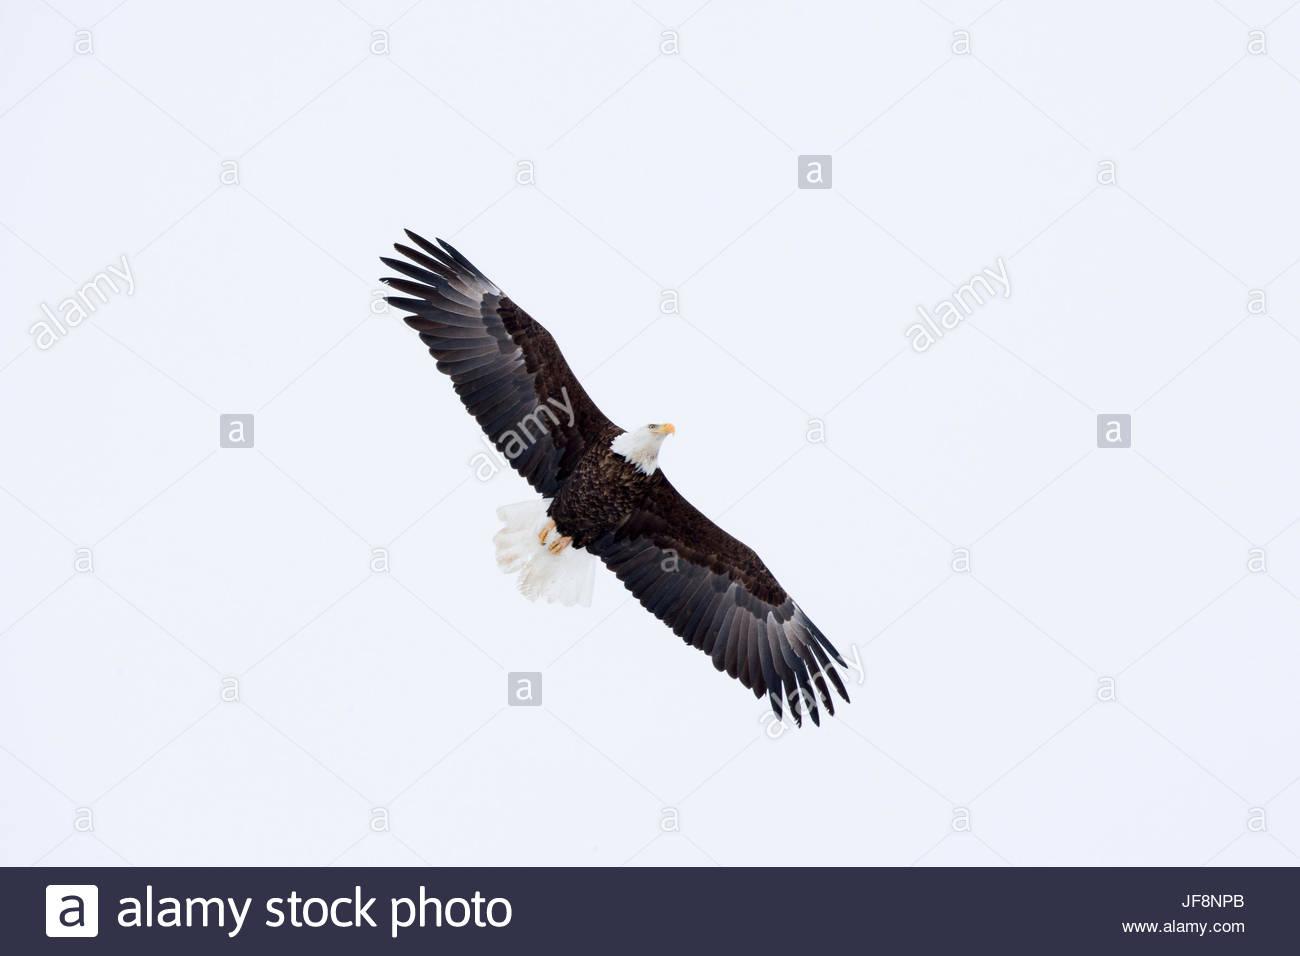 A bald eagle, Haliaeetus leucocephalus, soars through an overcast sky. Stock Photo